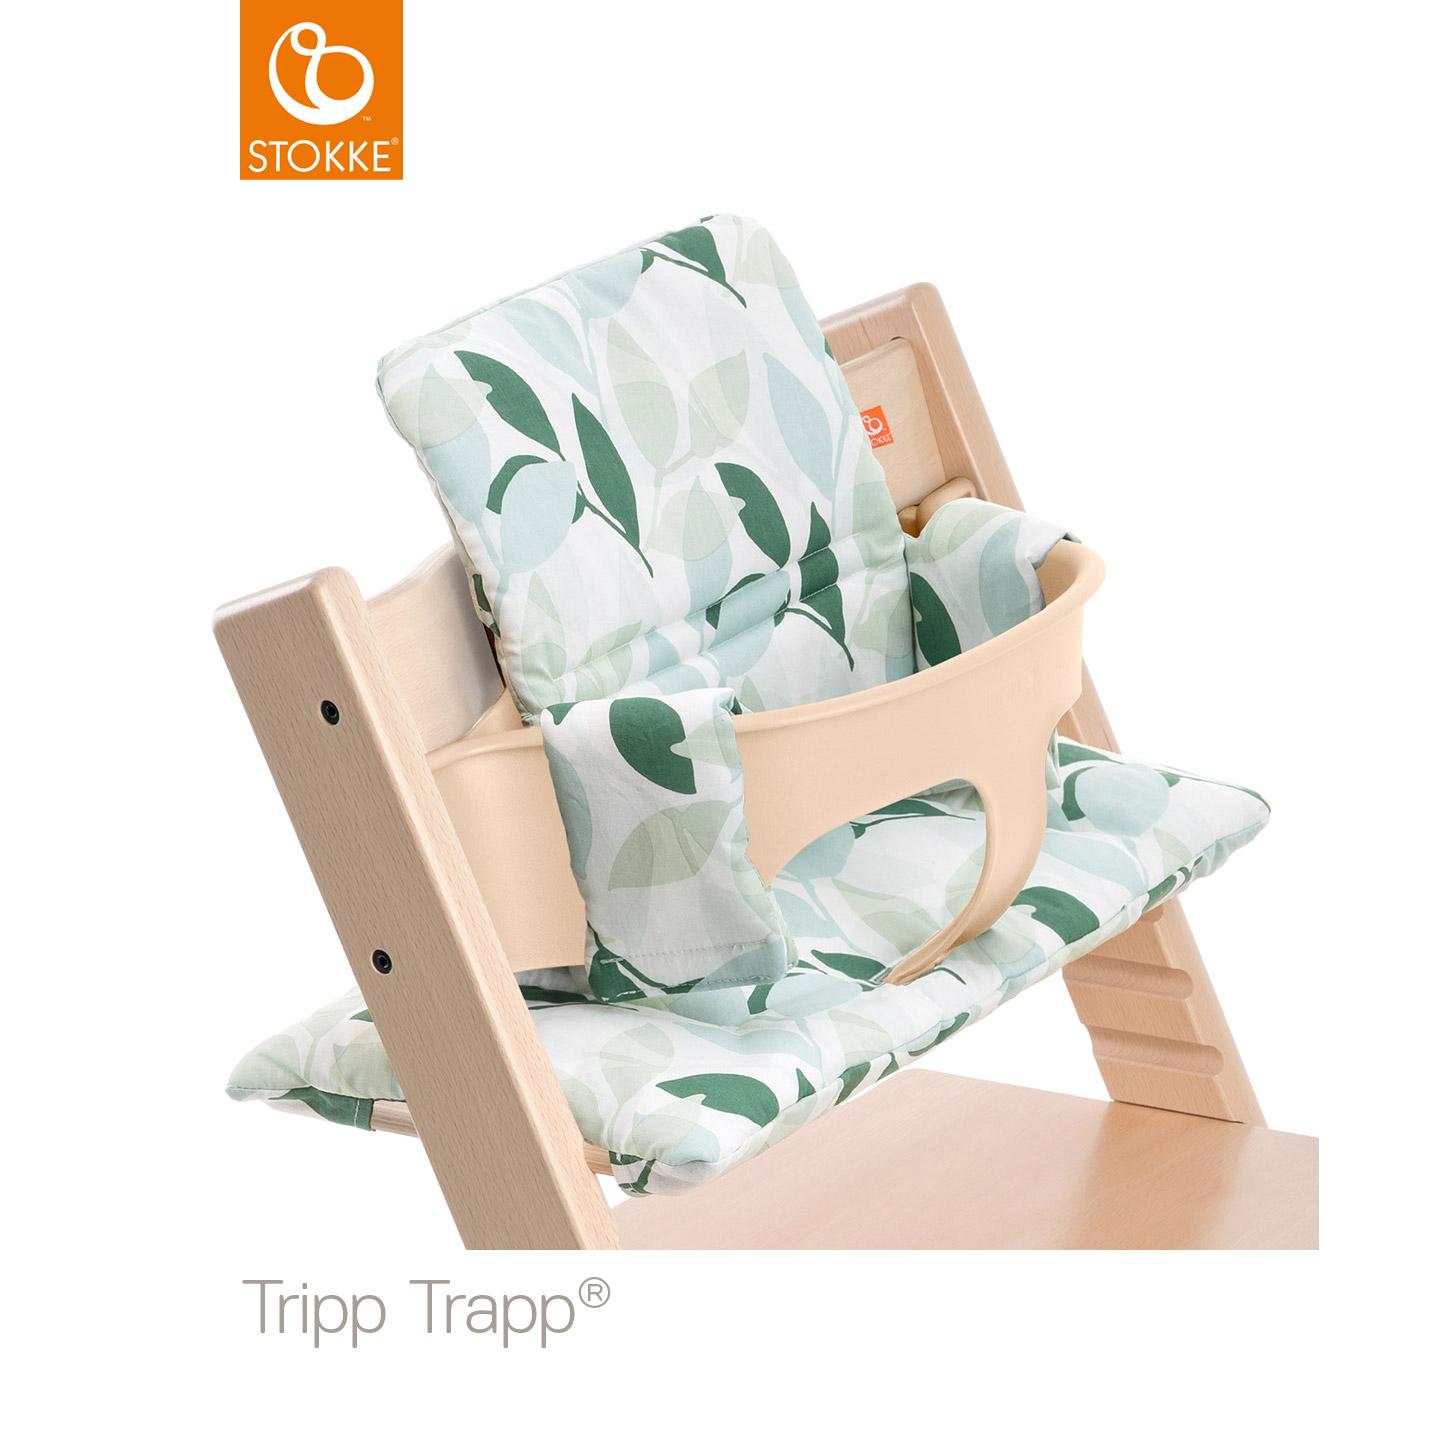 Coussin de chaise Tripp Trapp® Lucky grey  de Stokke®